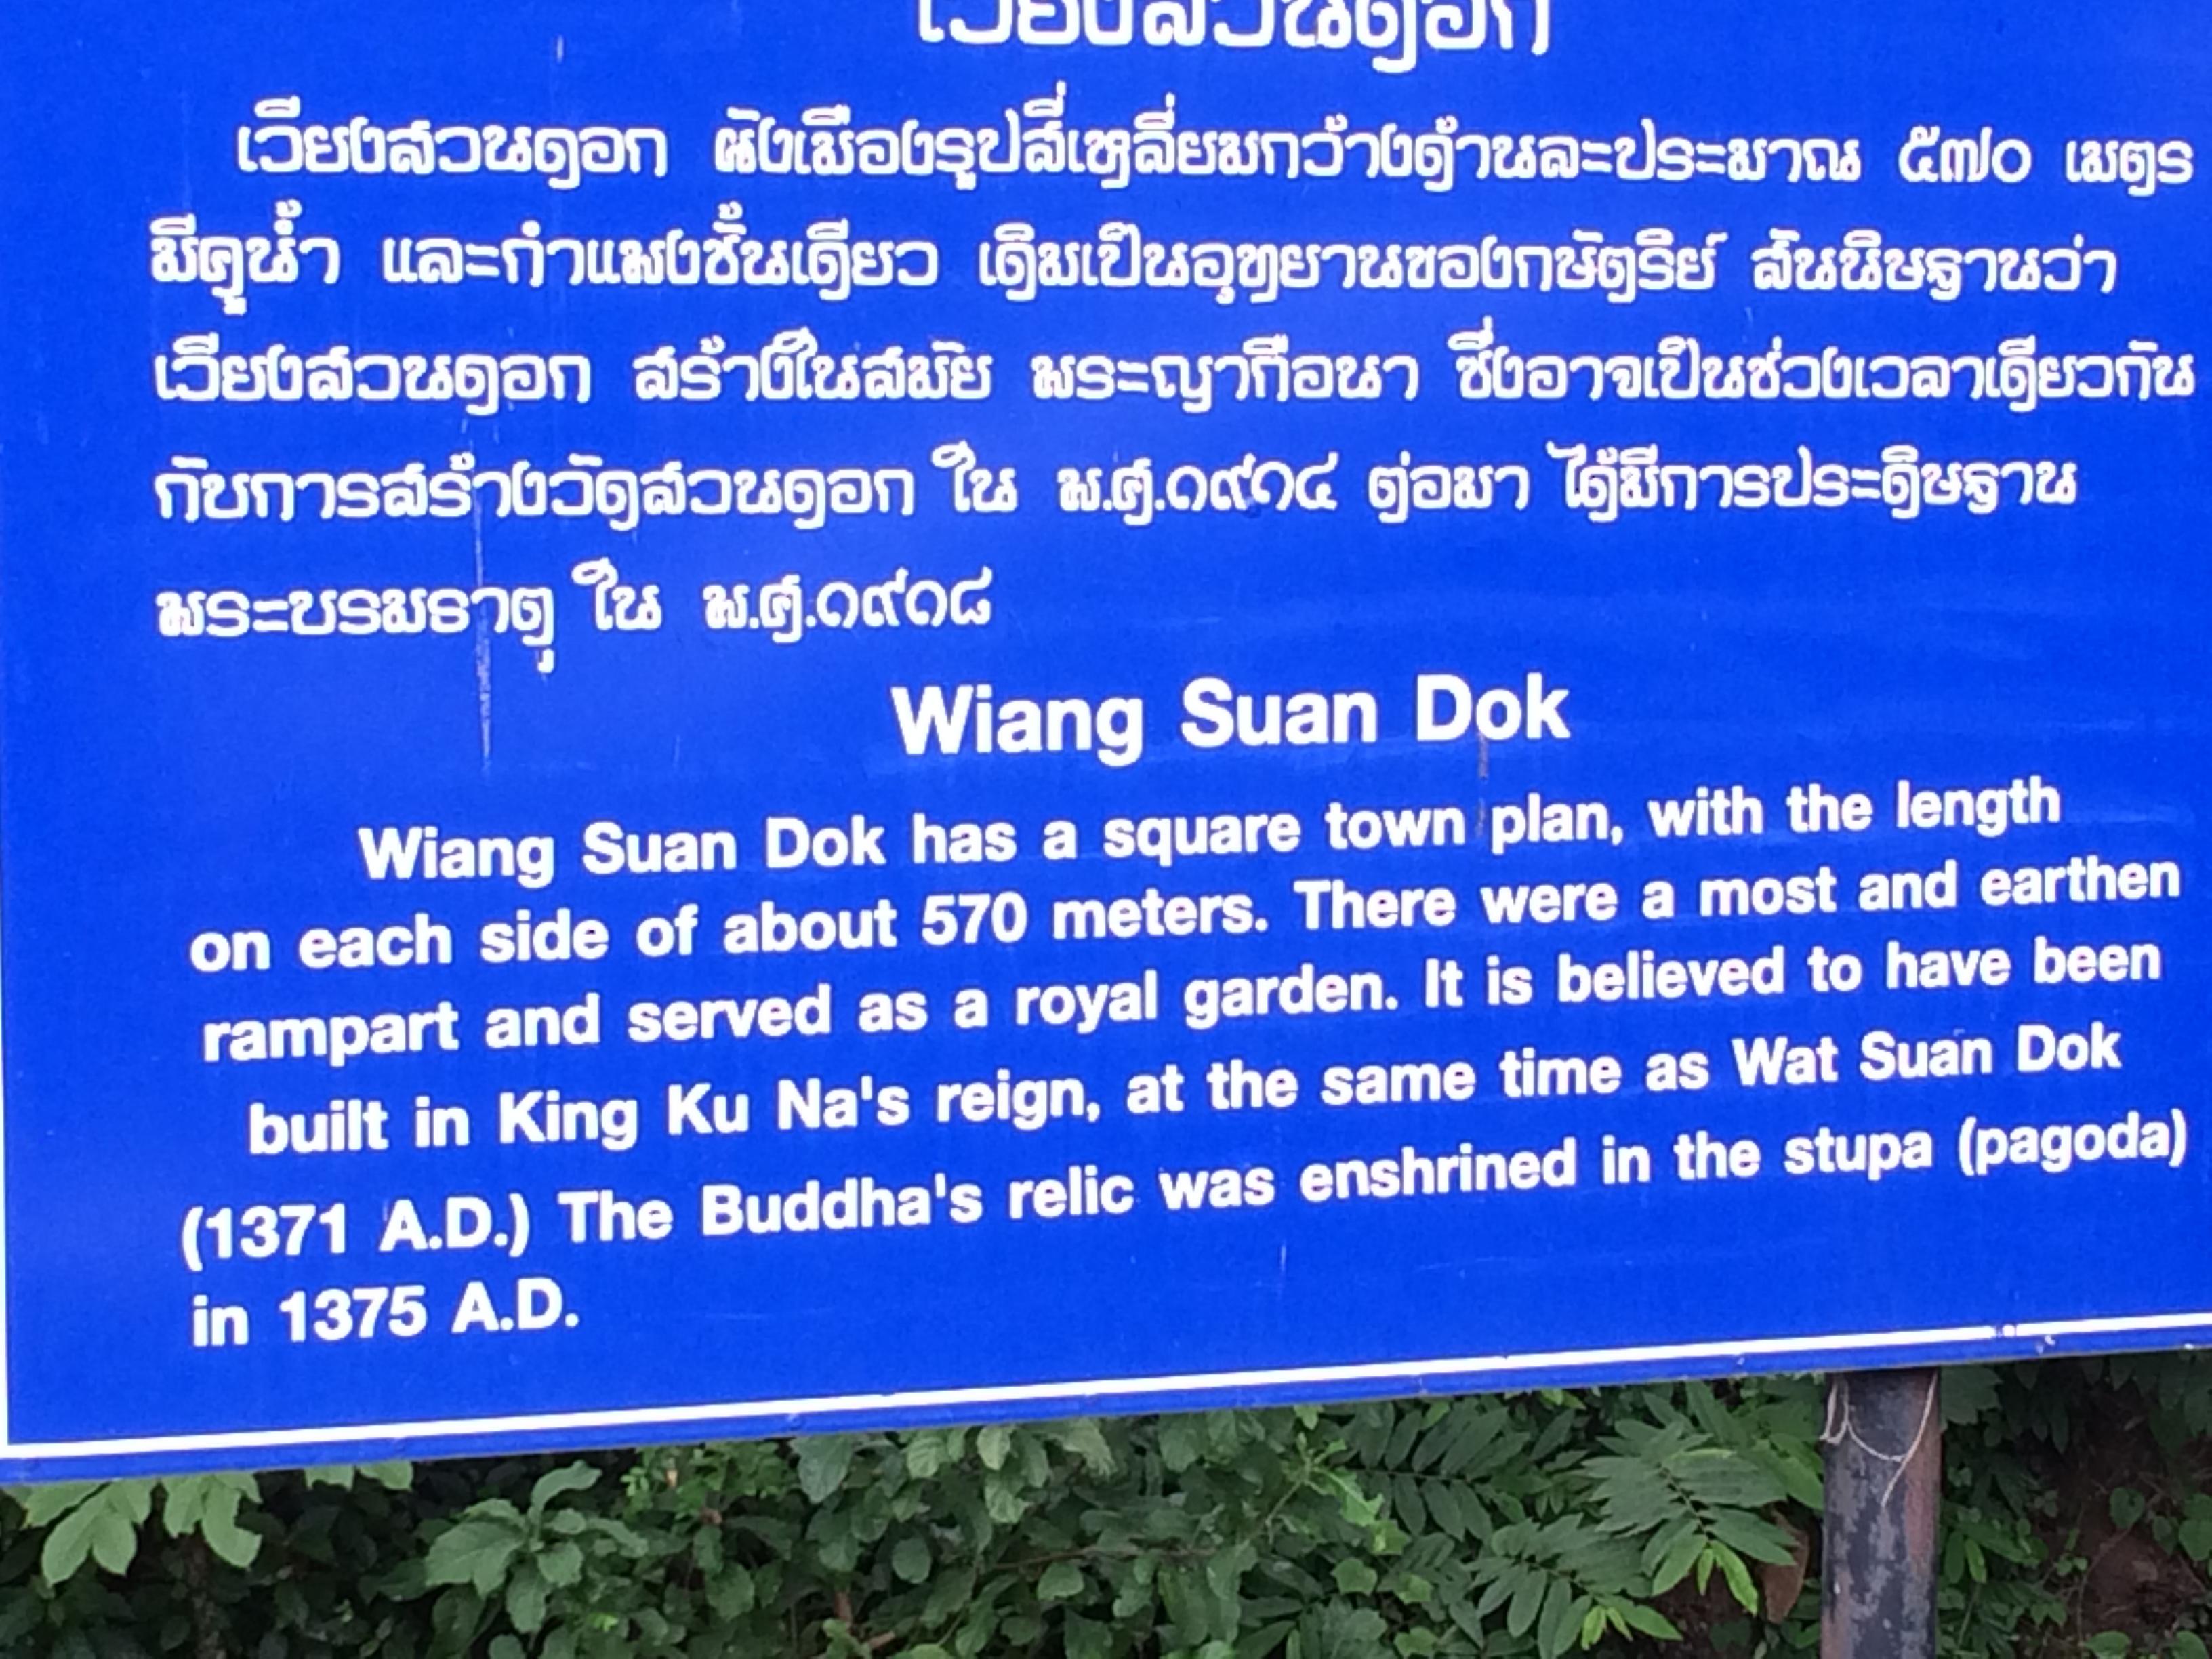 File:Wiang Suan Dork Description jpg - Wikimedia Commons